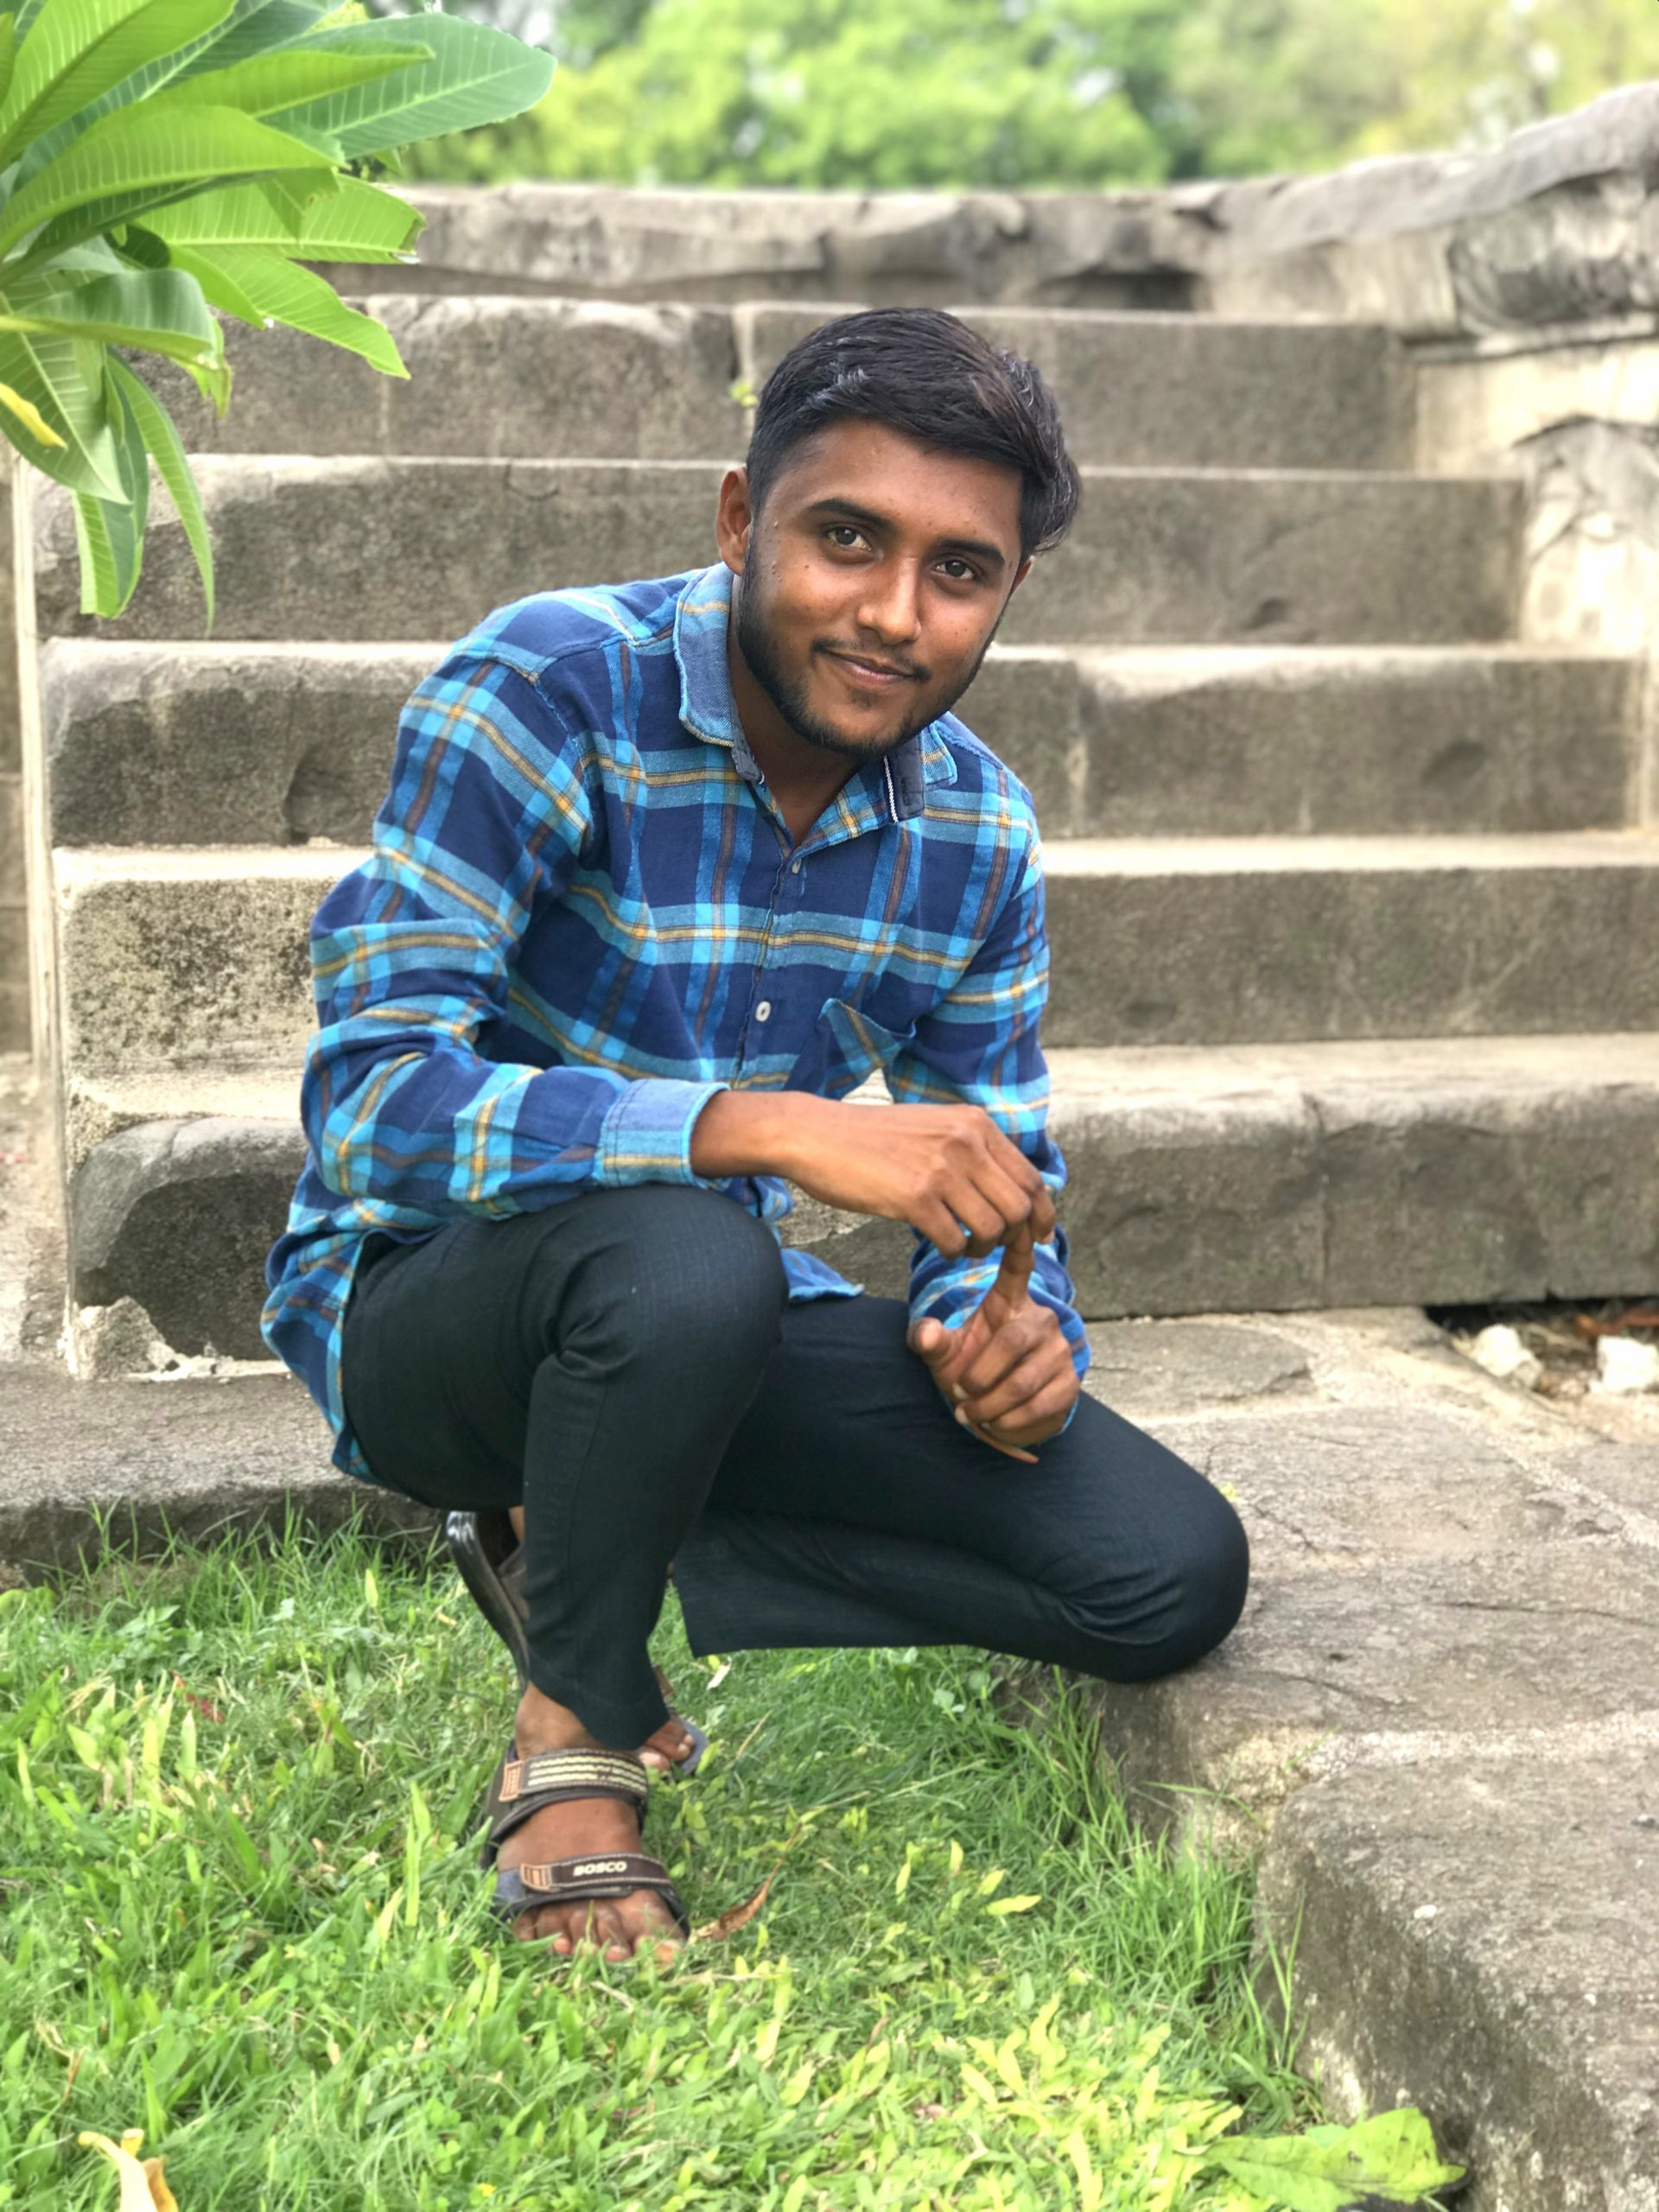 Boy posing in garden